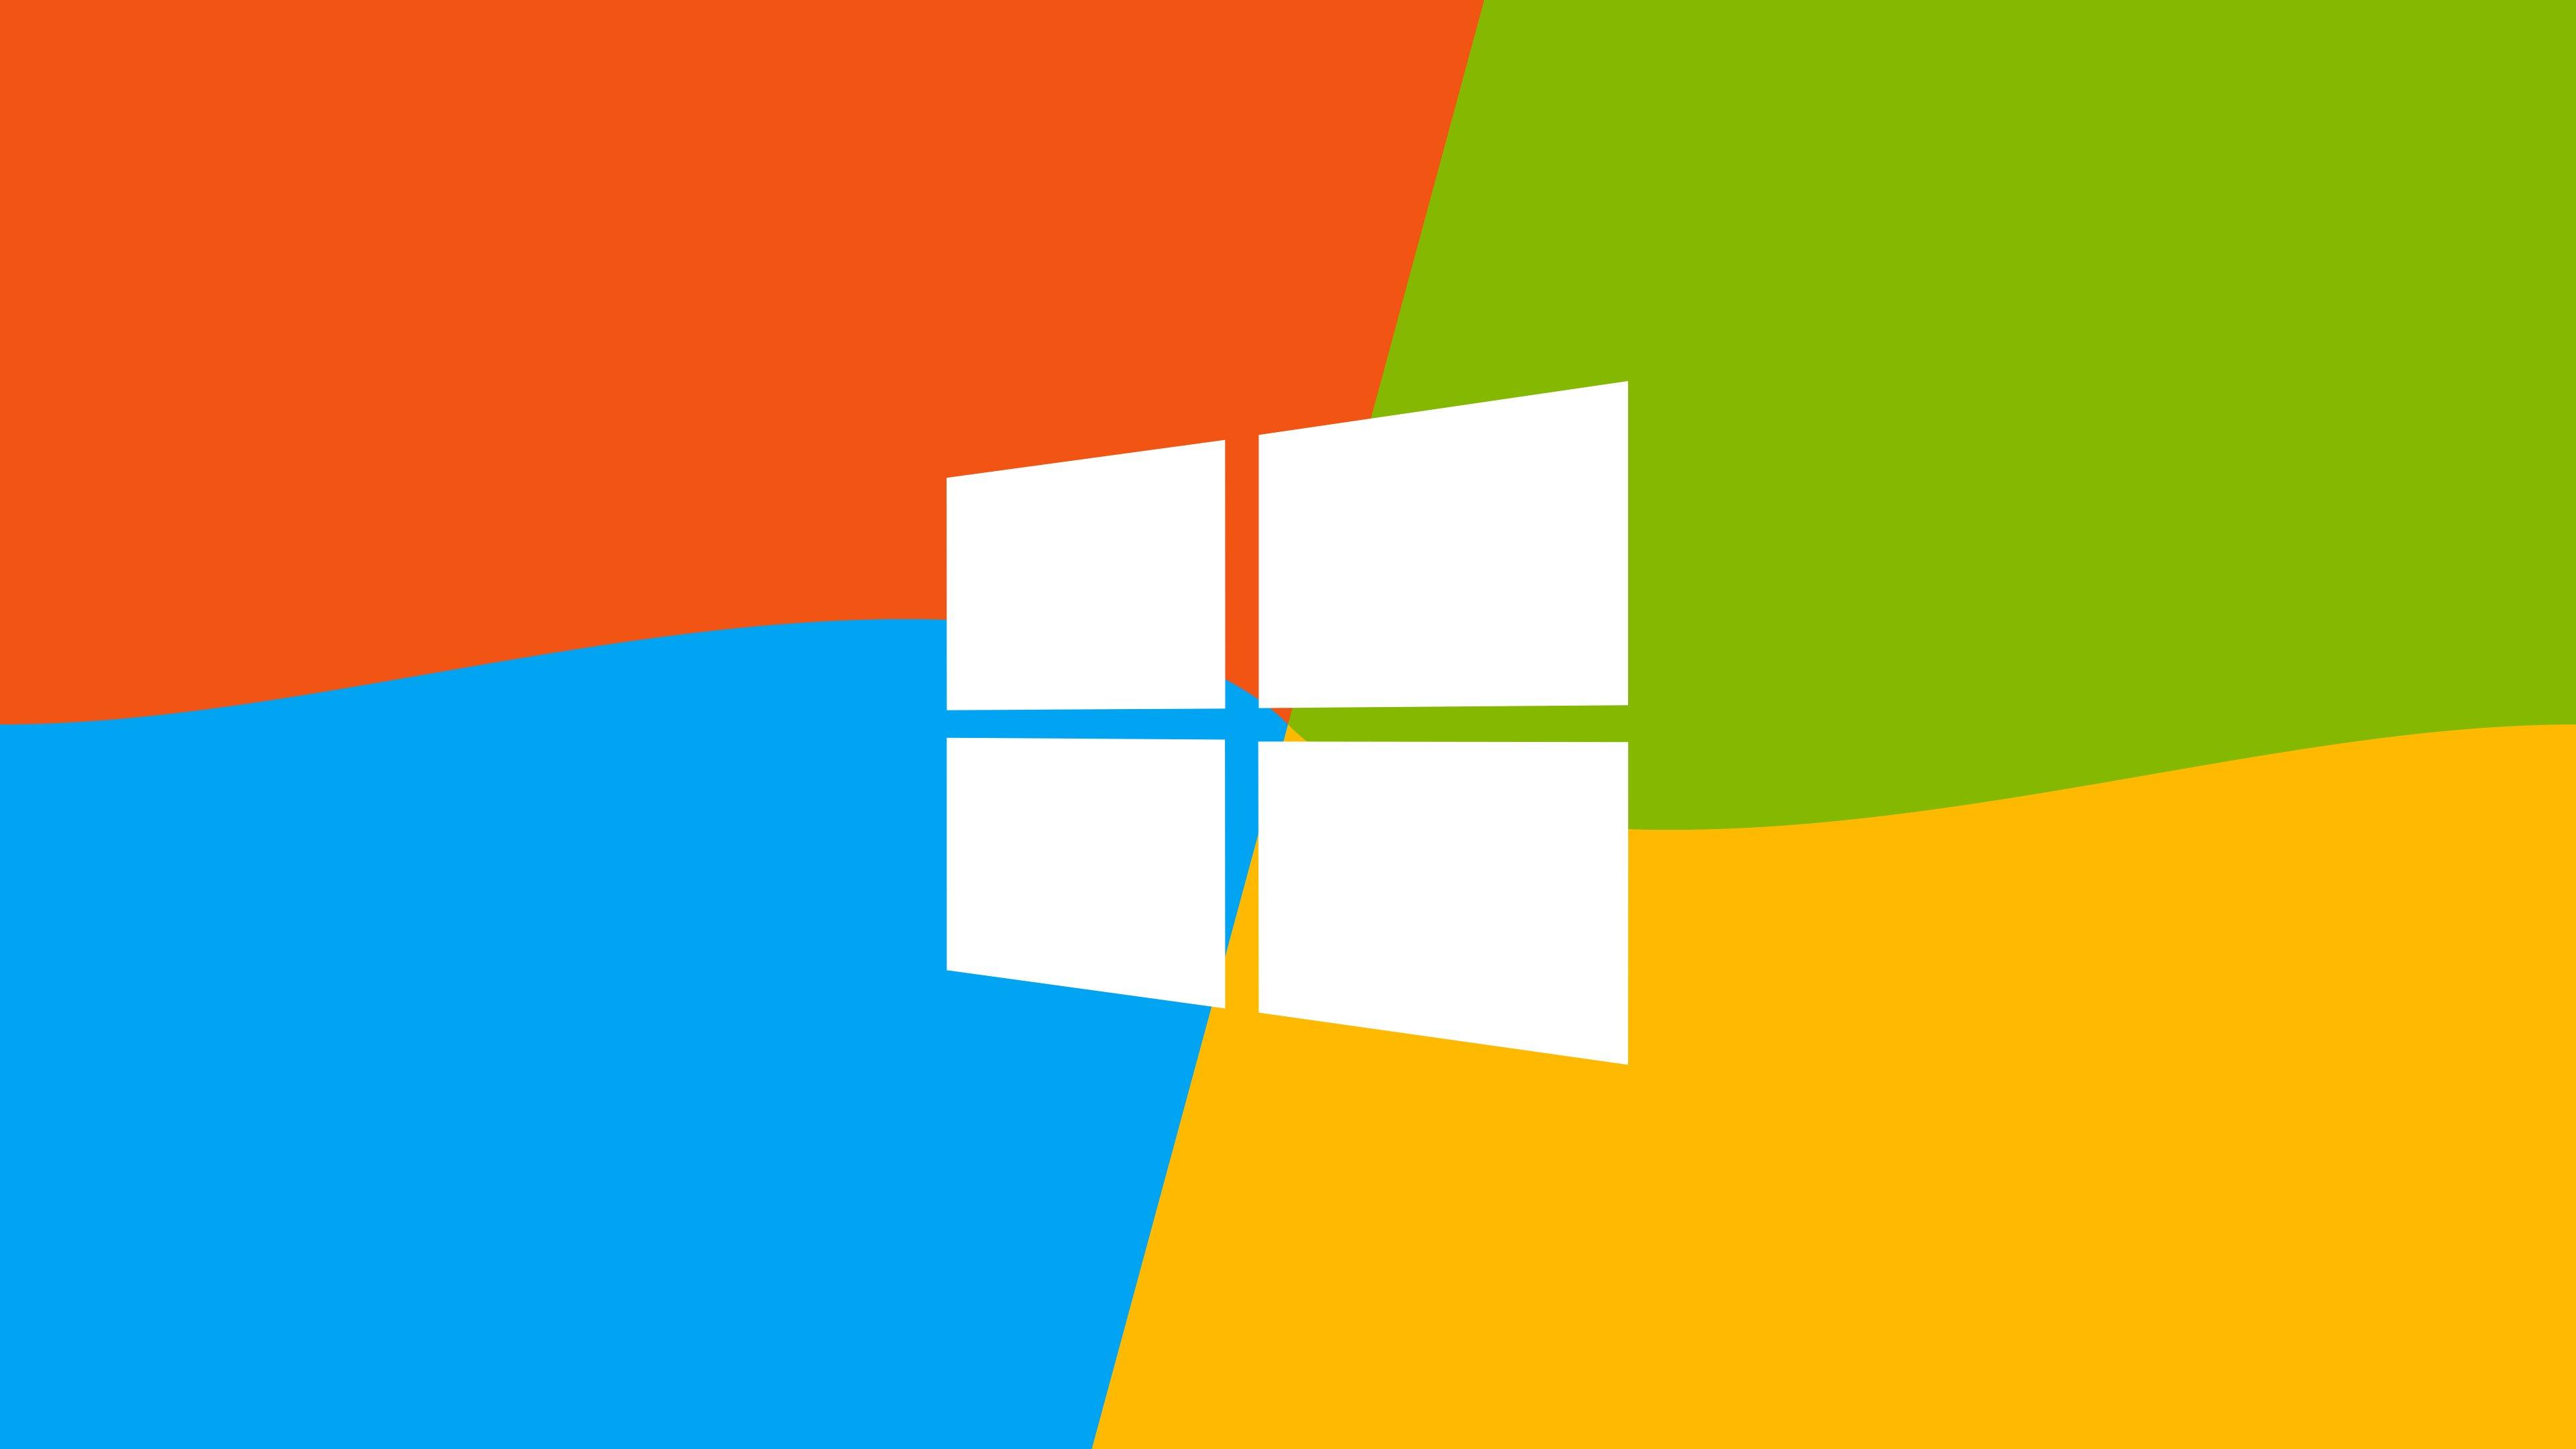 10 Windows Laptop Cartoon Hd Wallpapers